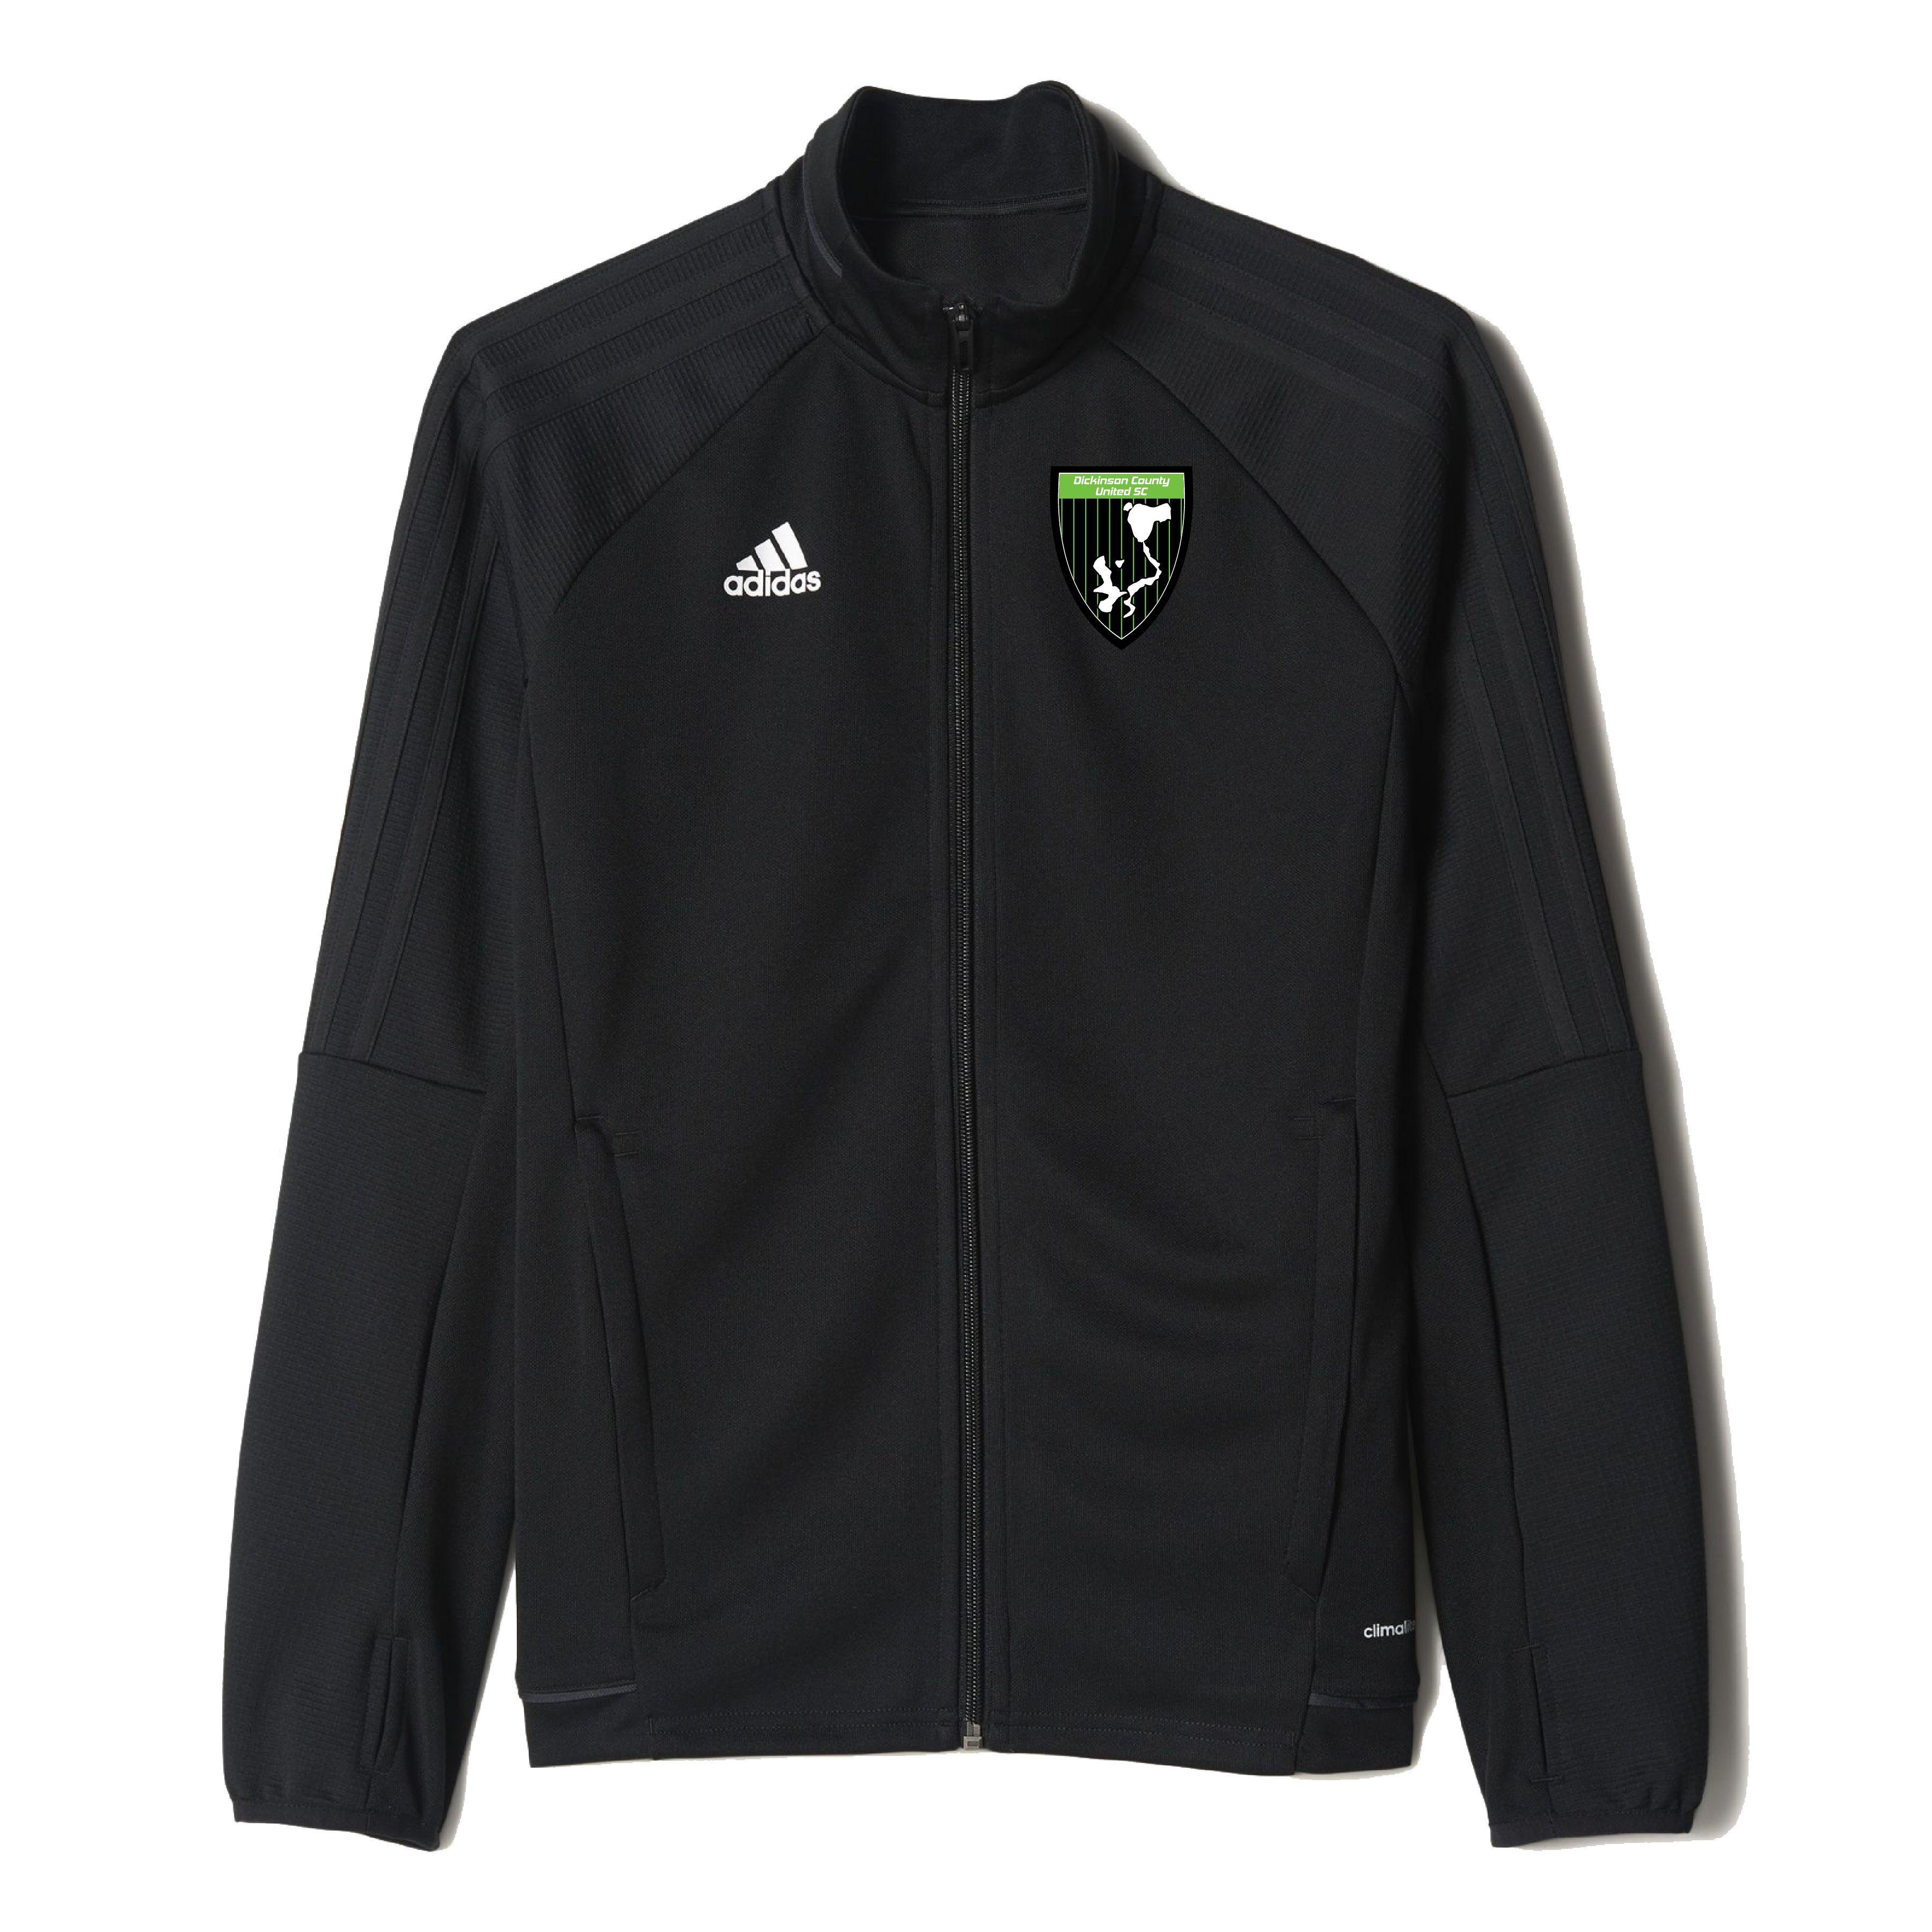 adidas Dickinson County Soccer Club Tiro 17 Training Jacket - Youth 0371b7d983